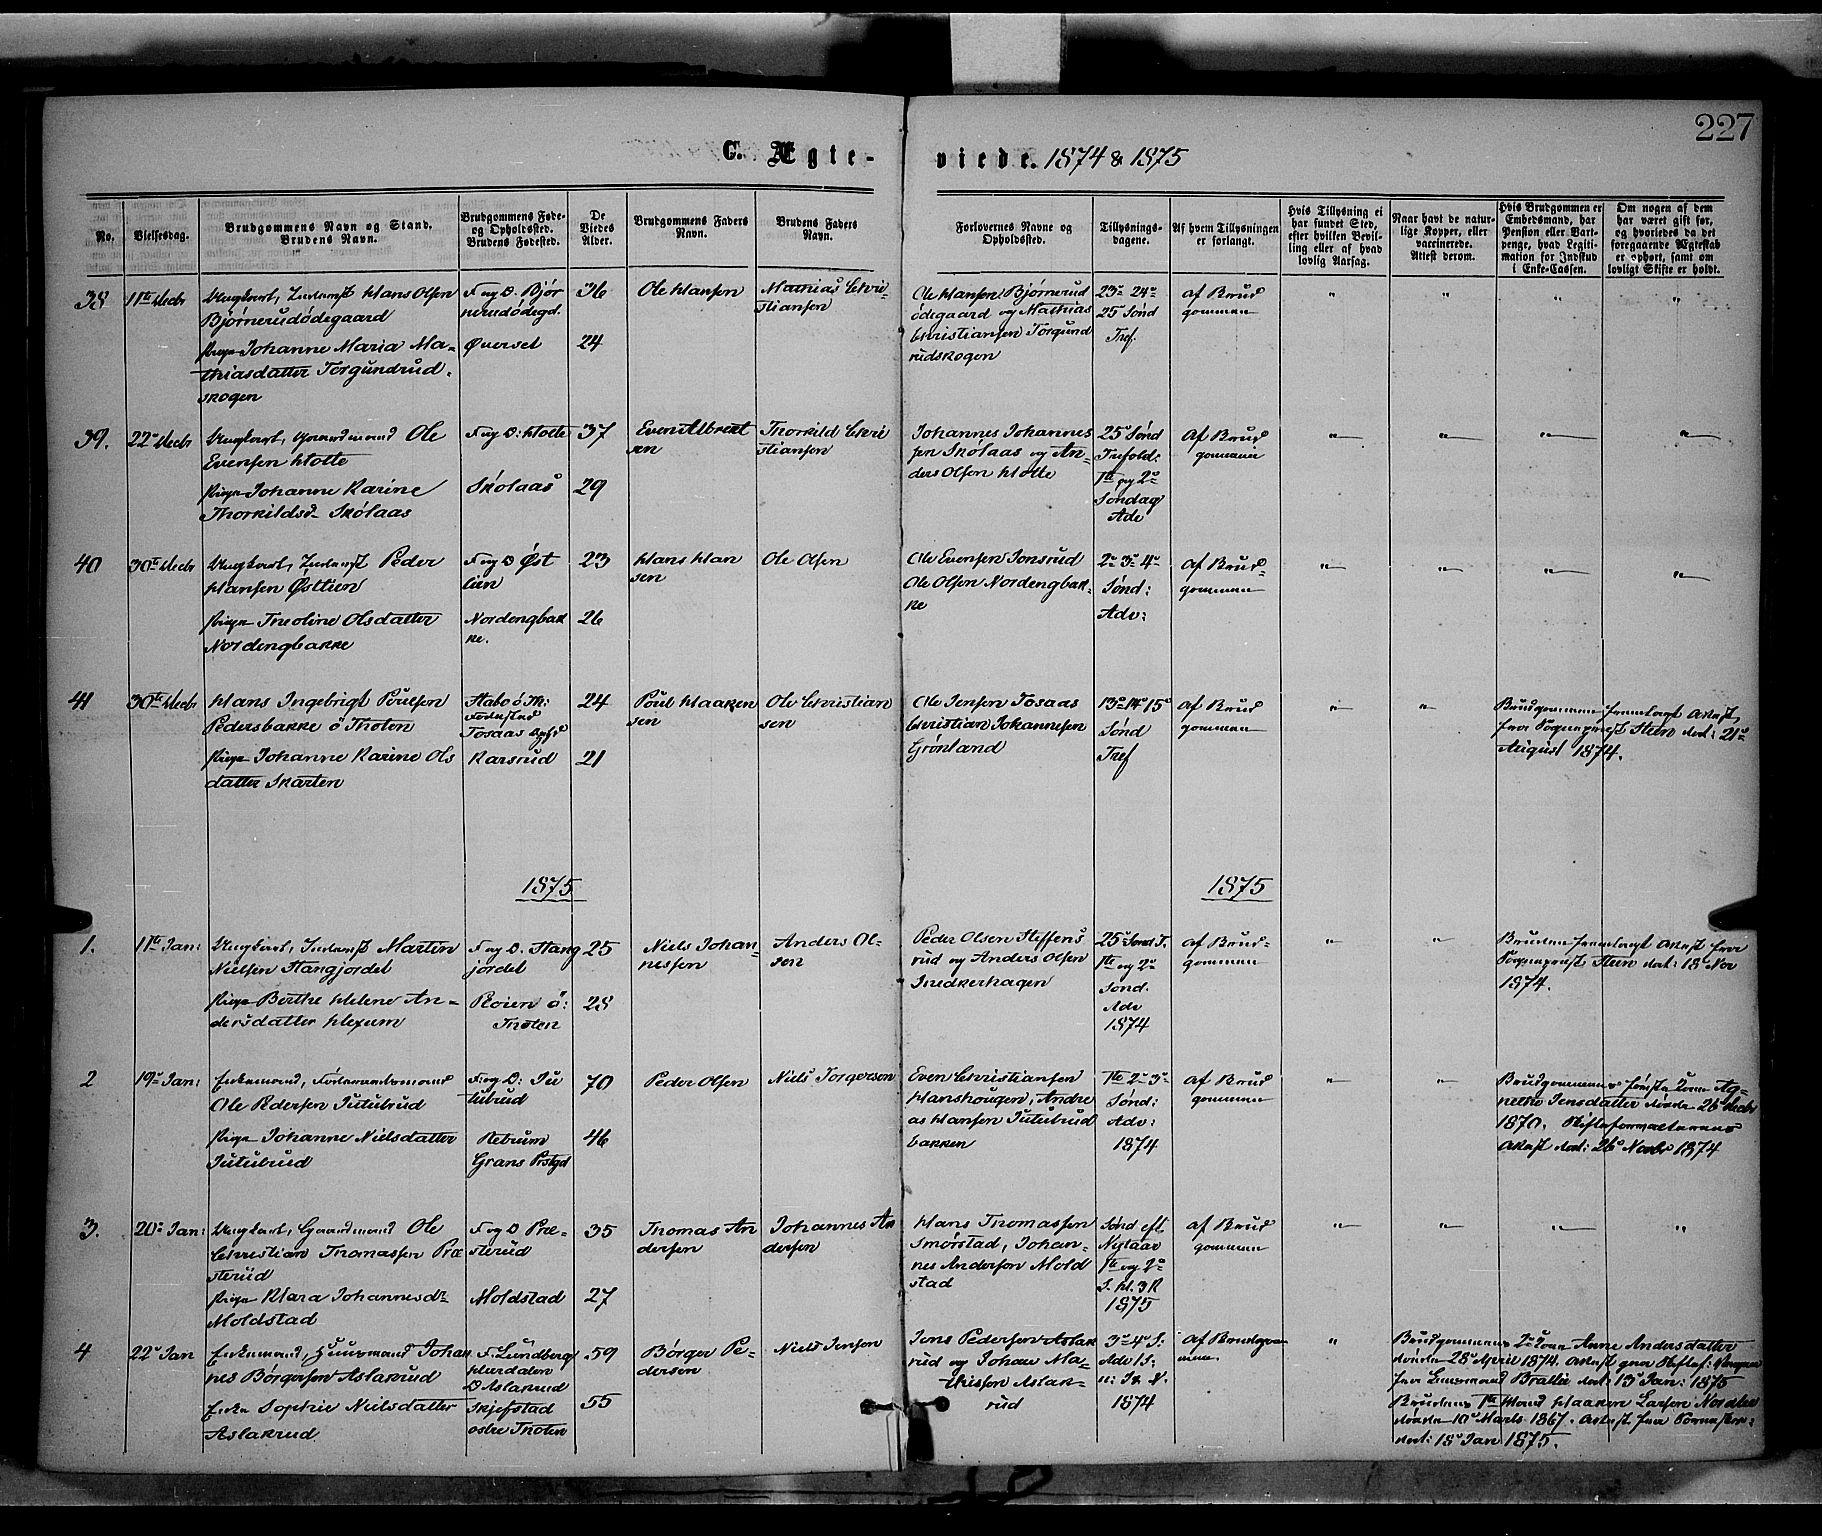 SAH, Vestre Toten prestekontor, H/Ha/Haa/L0008: Ministerialbok nr. 8, 1870-1877, s. 227